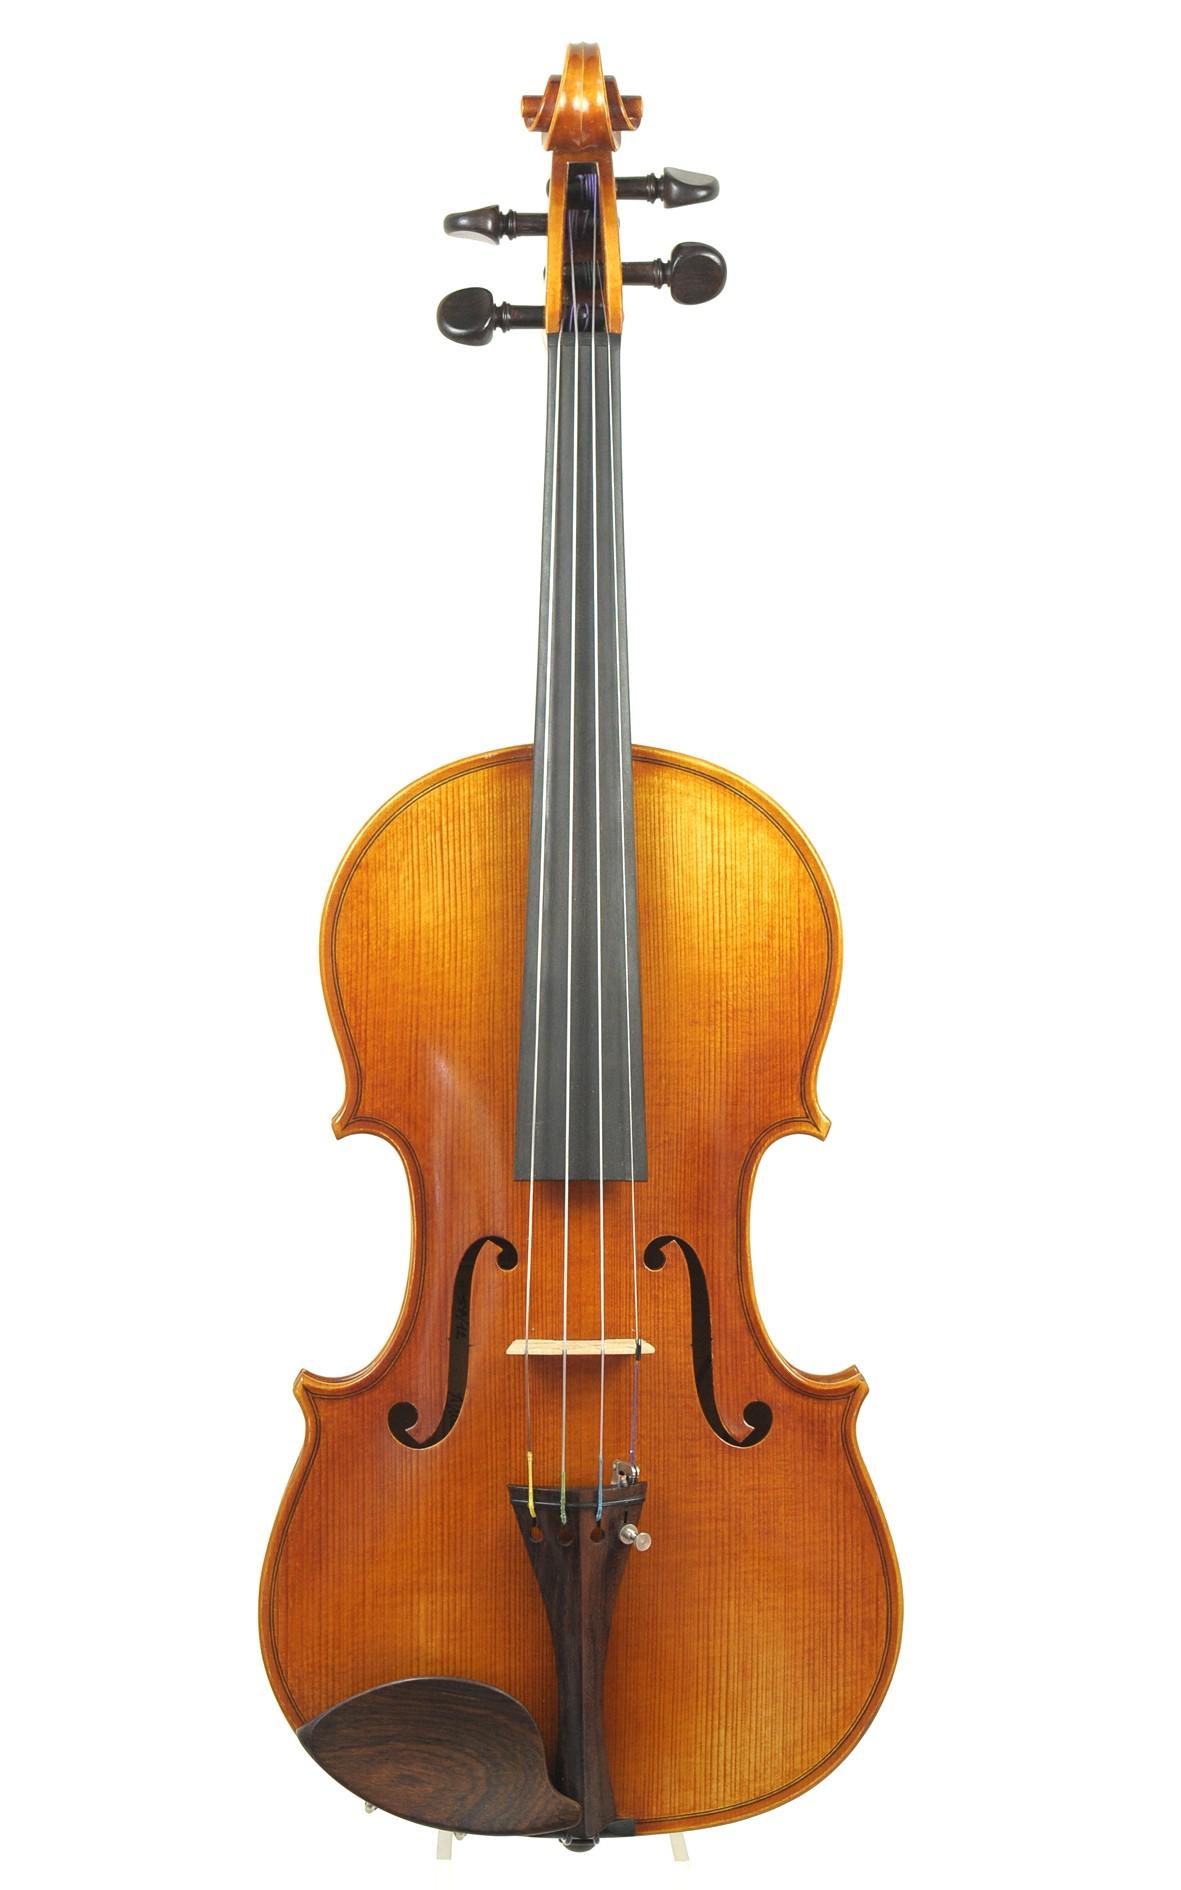 Contemporary French violin, Alain Moinier, Mirecourt